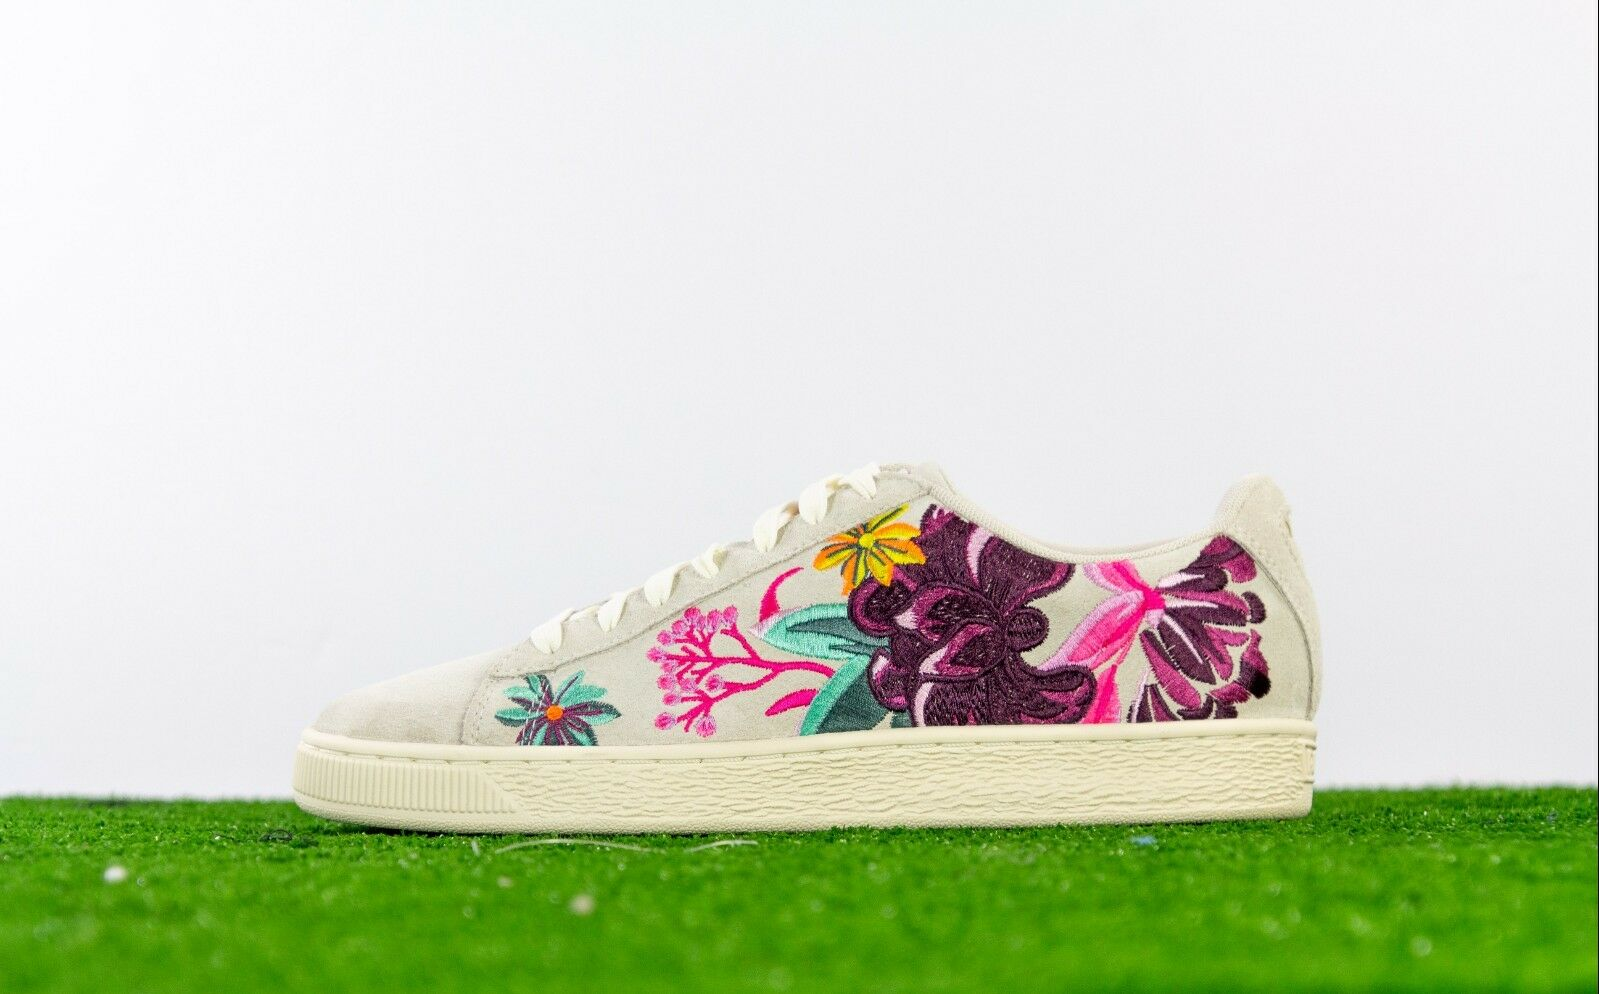 Puma Gamuza Hyper bordar para mujeres Zapatos Whisper blancoo Orquídea Orquídea Orquídea 368137-01 Talla 10  alta calidad